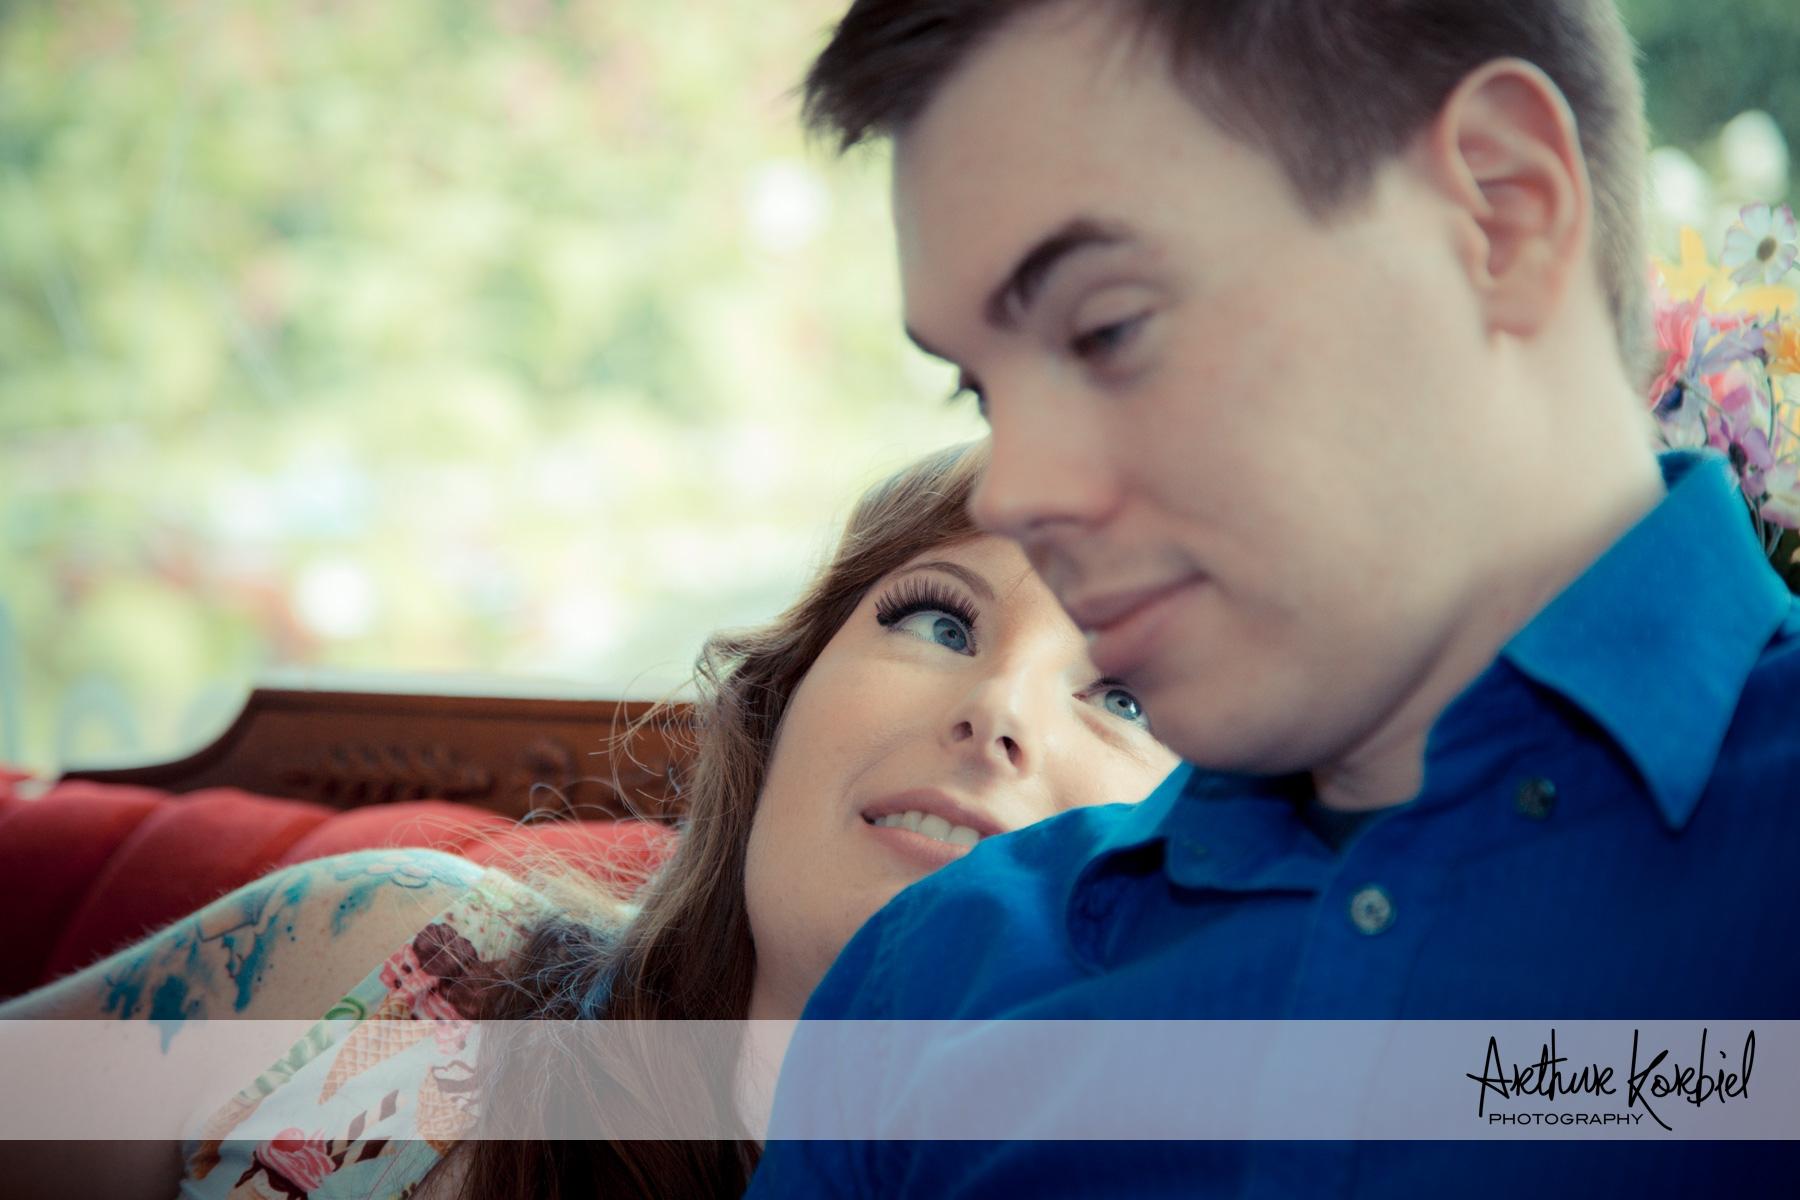 Arthur Korbiel Photography - London Engagement Photographer - Erin &Cameron-009.jpg